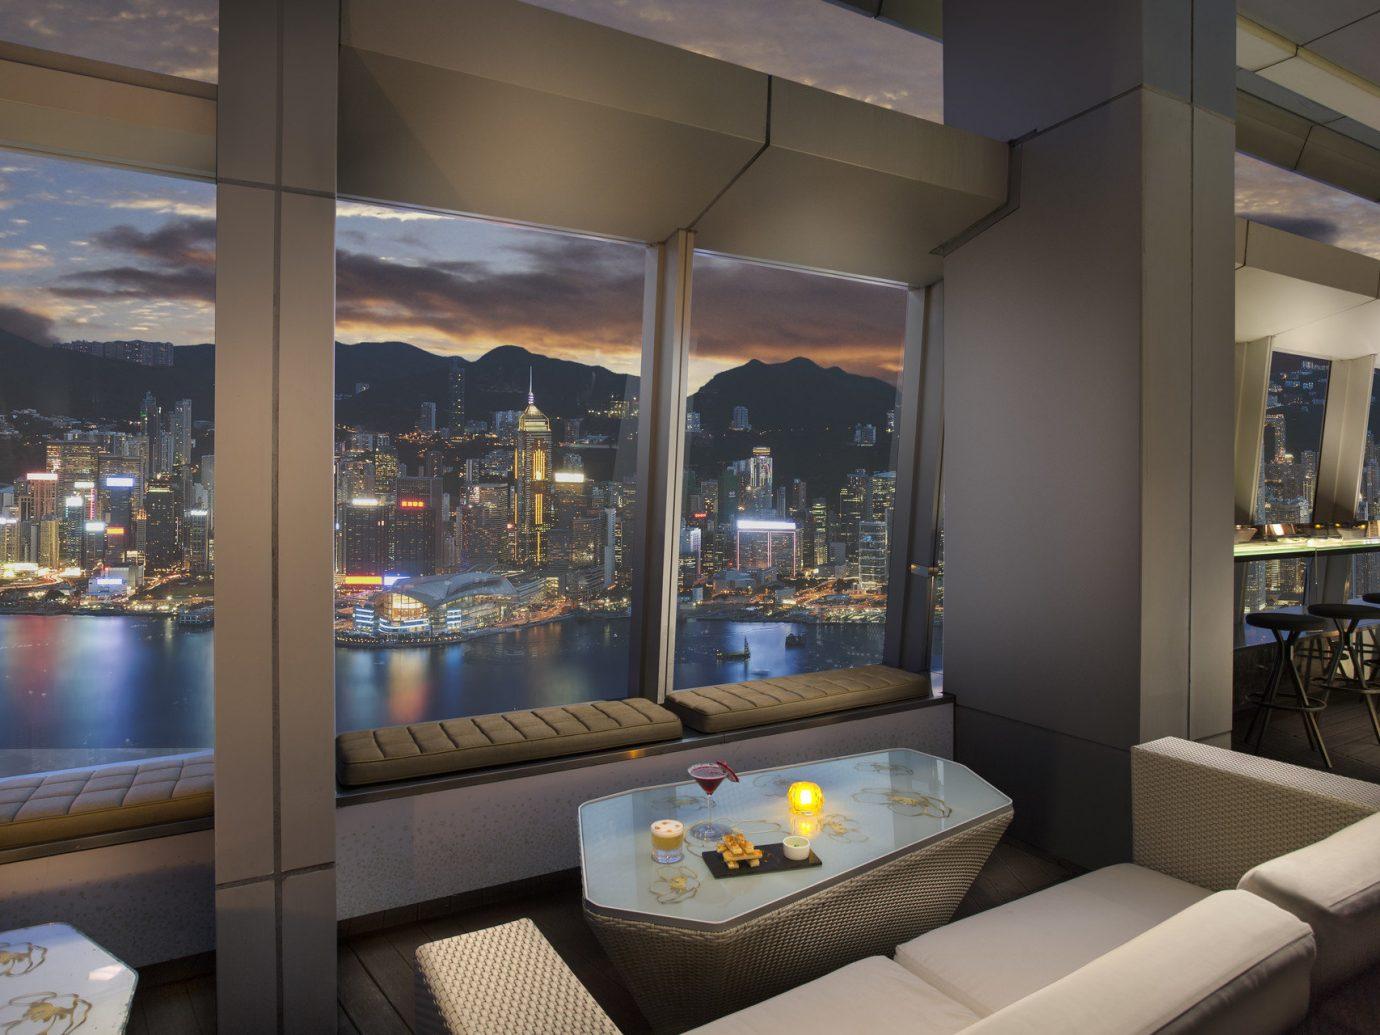 Hong Kong skyline from Ritz-Carlton interior